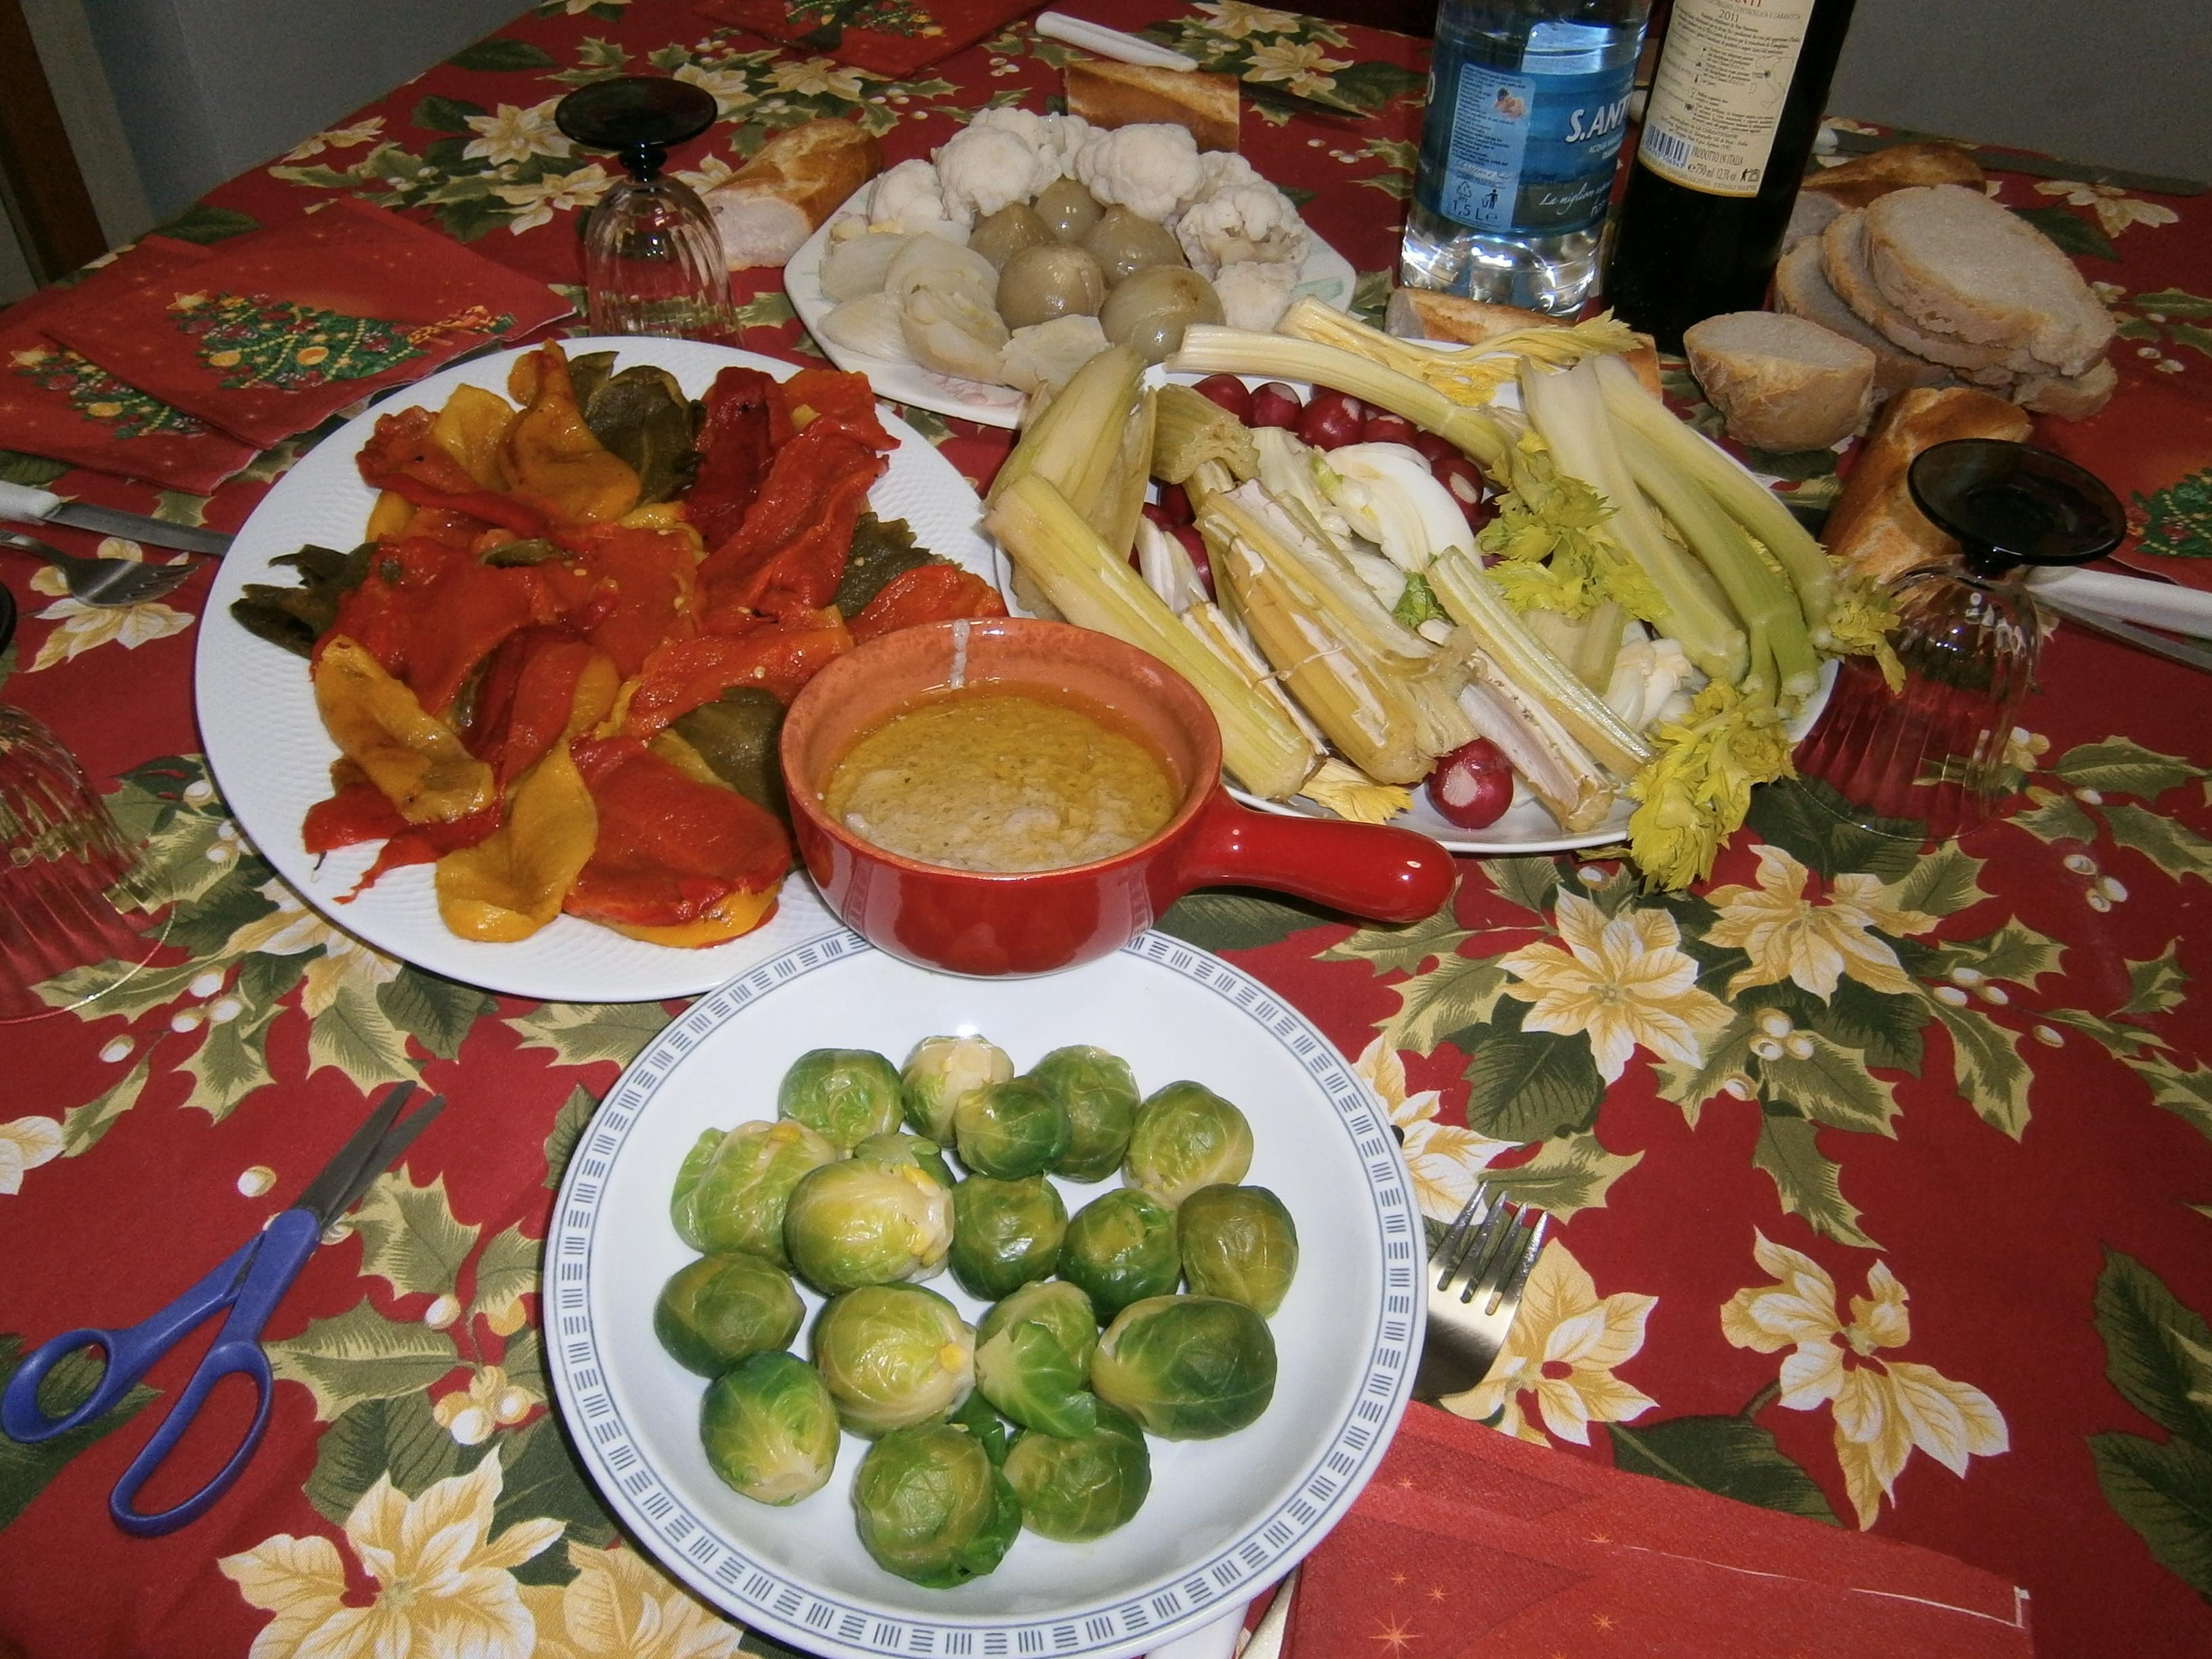 Dal Piemonte alla Toscana – Allegria in cucina